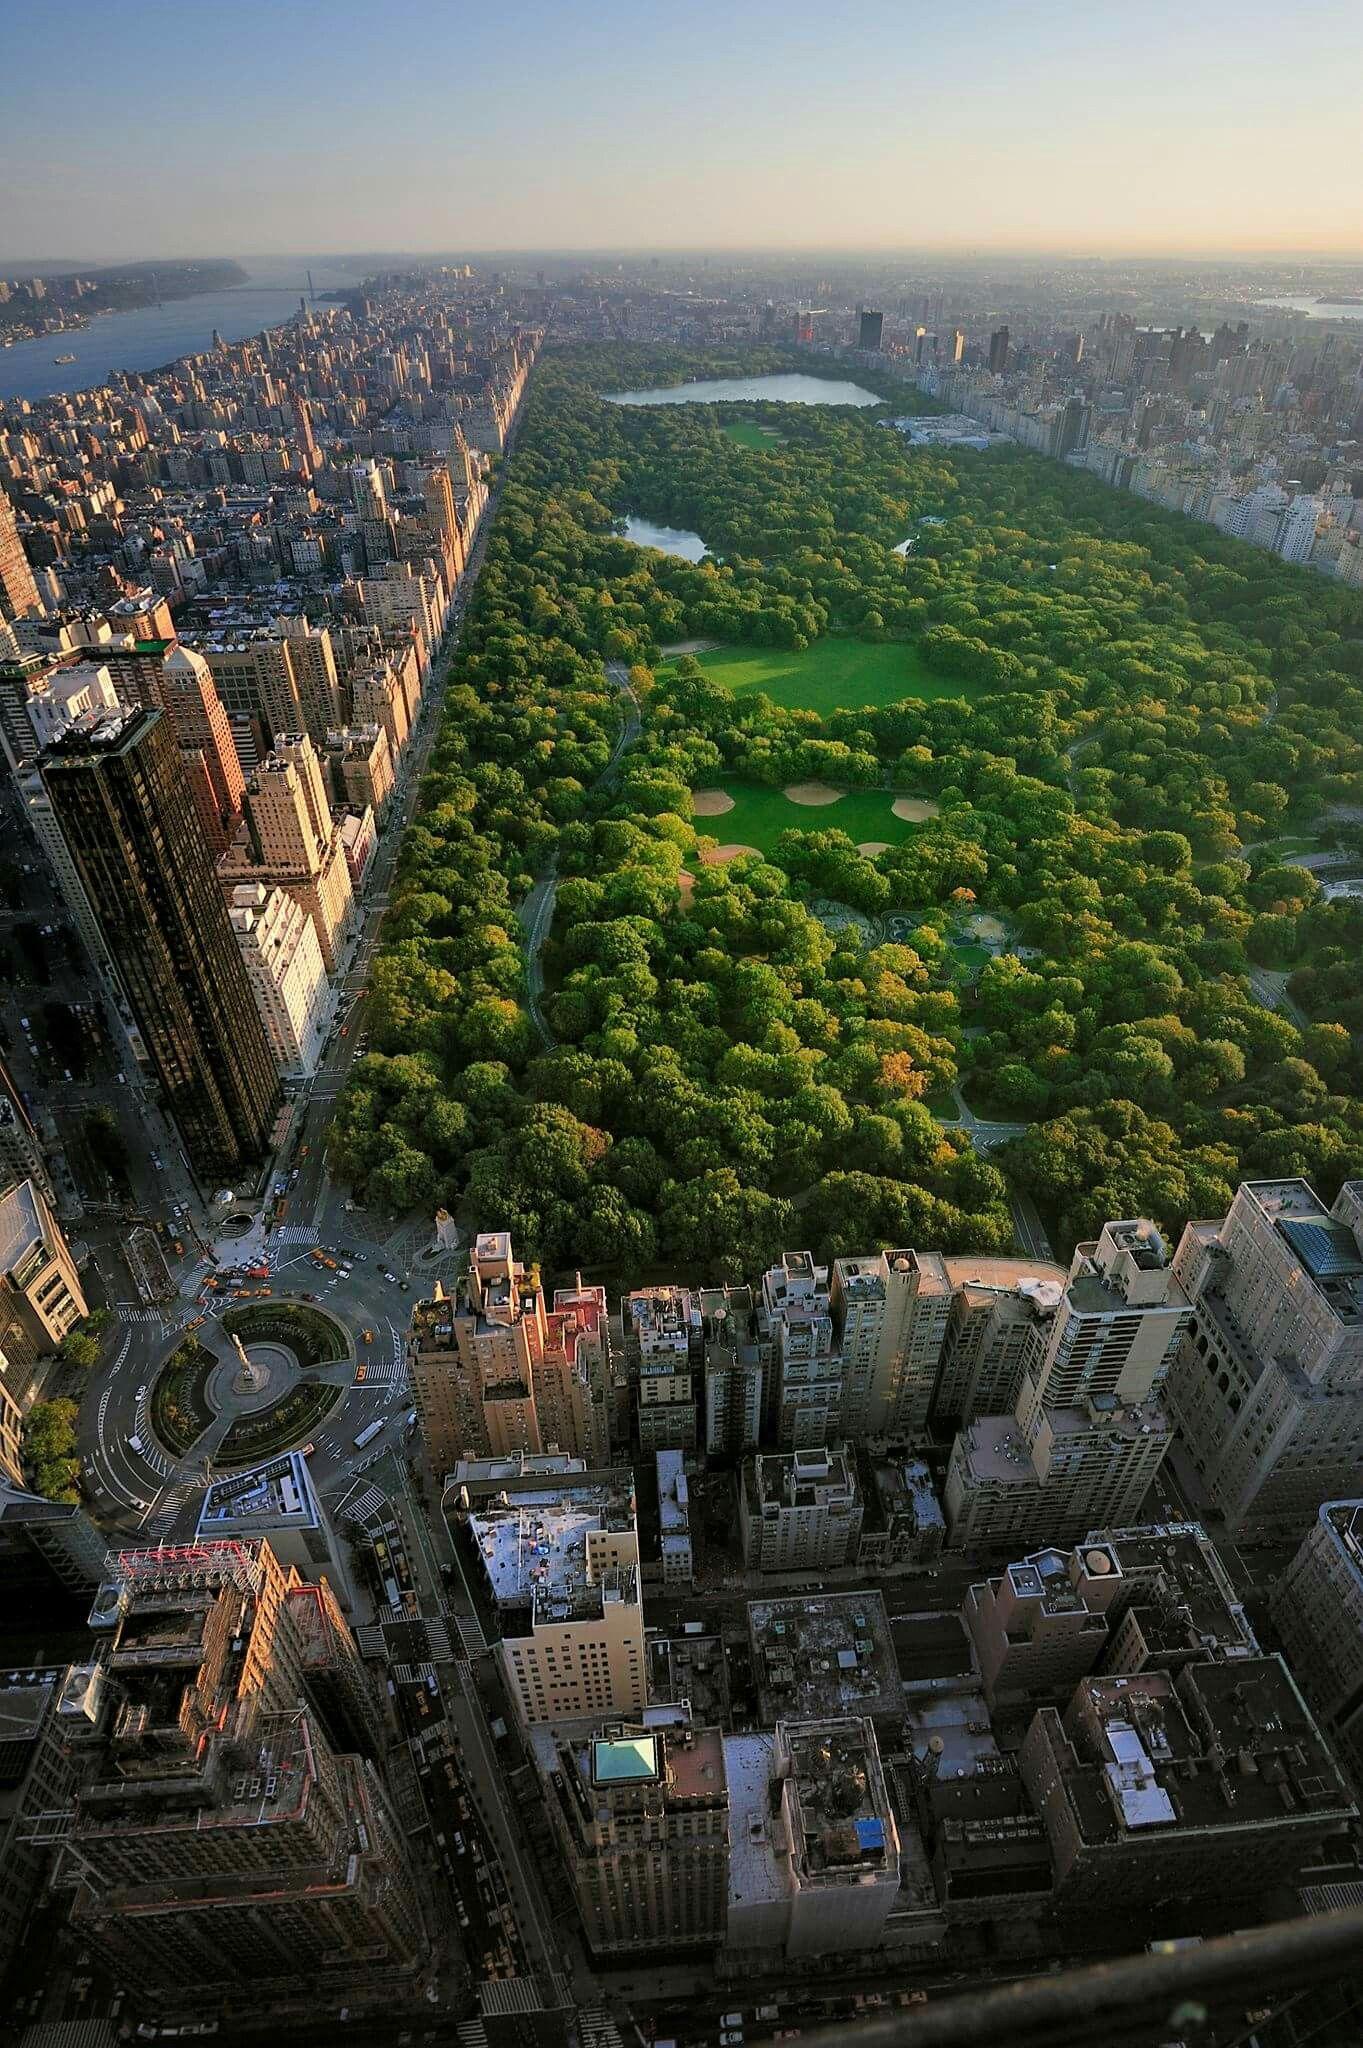 Nyc Flights Hotels Car Rentals Www Worldtourandtravel Com Visit